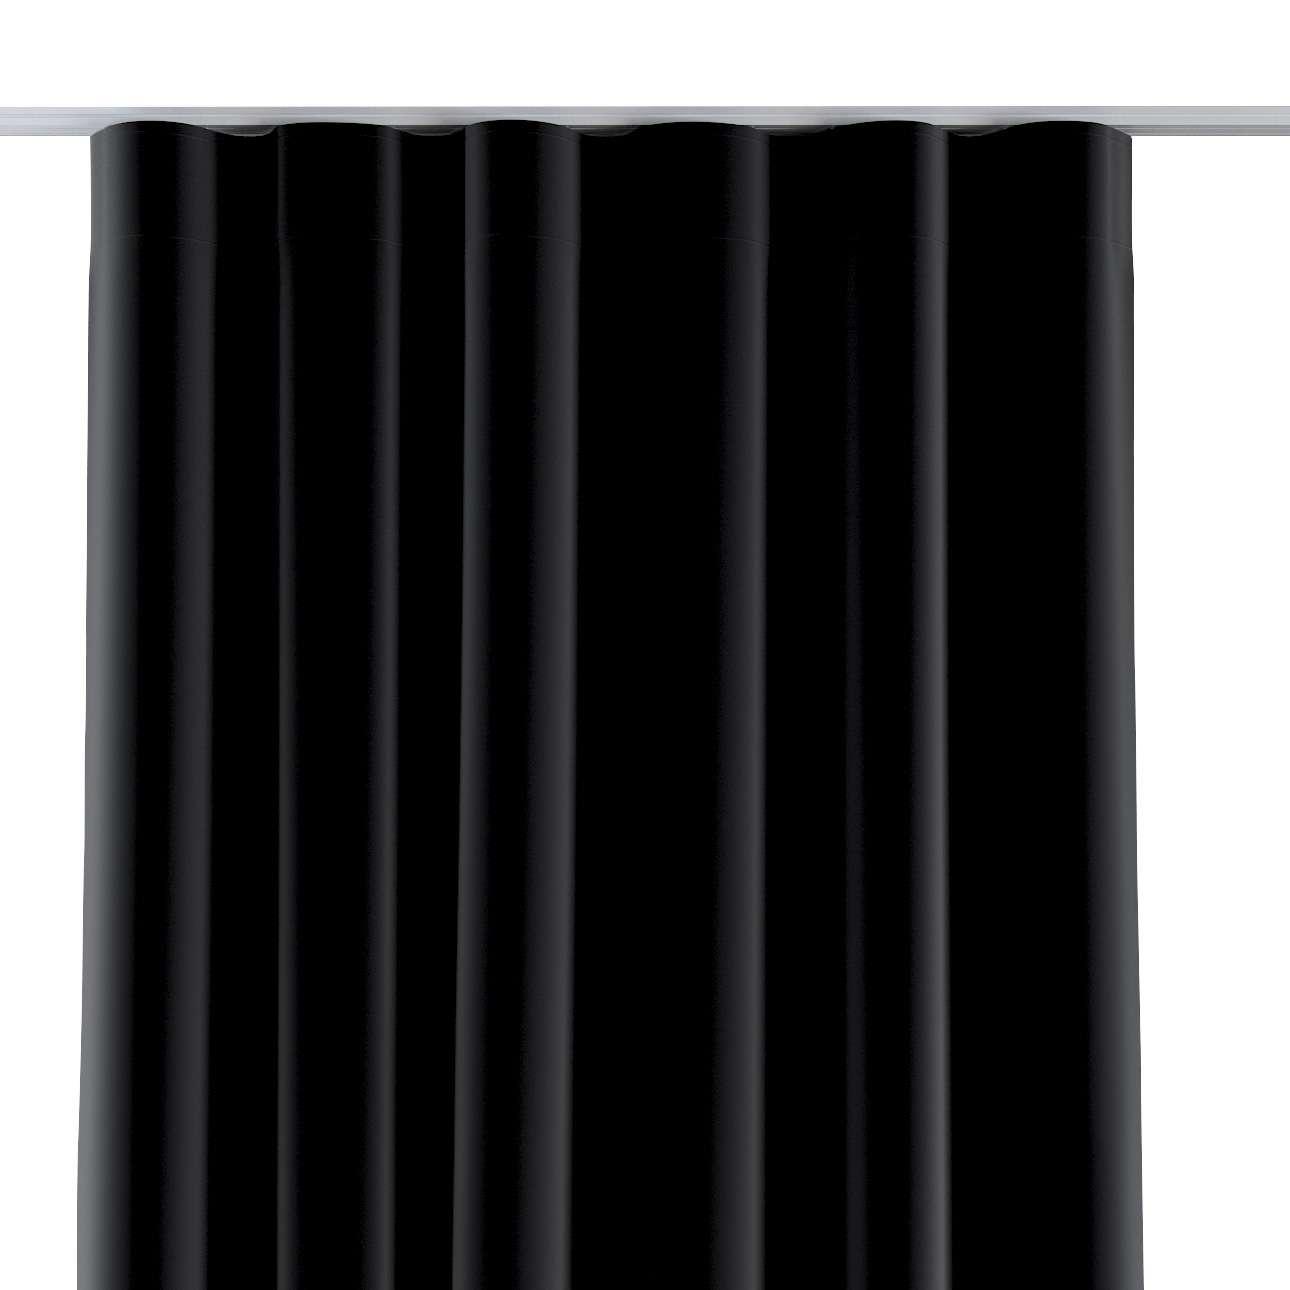 Zaves s riasením WAVE V kolekcii Velvet, tkanina: 704-17